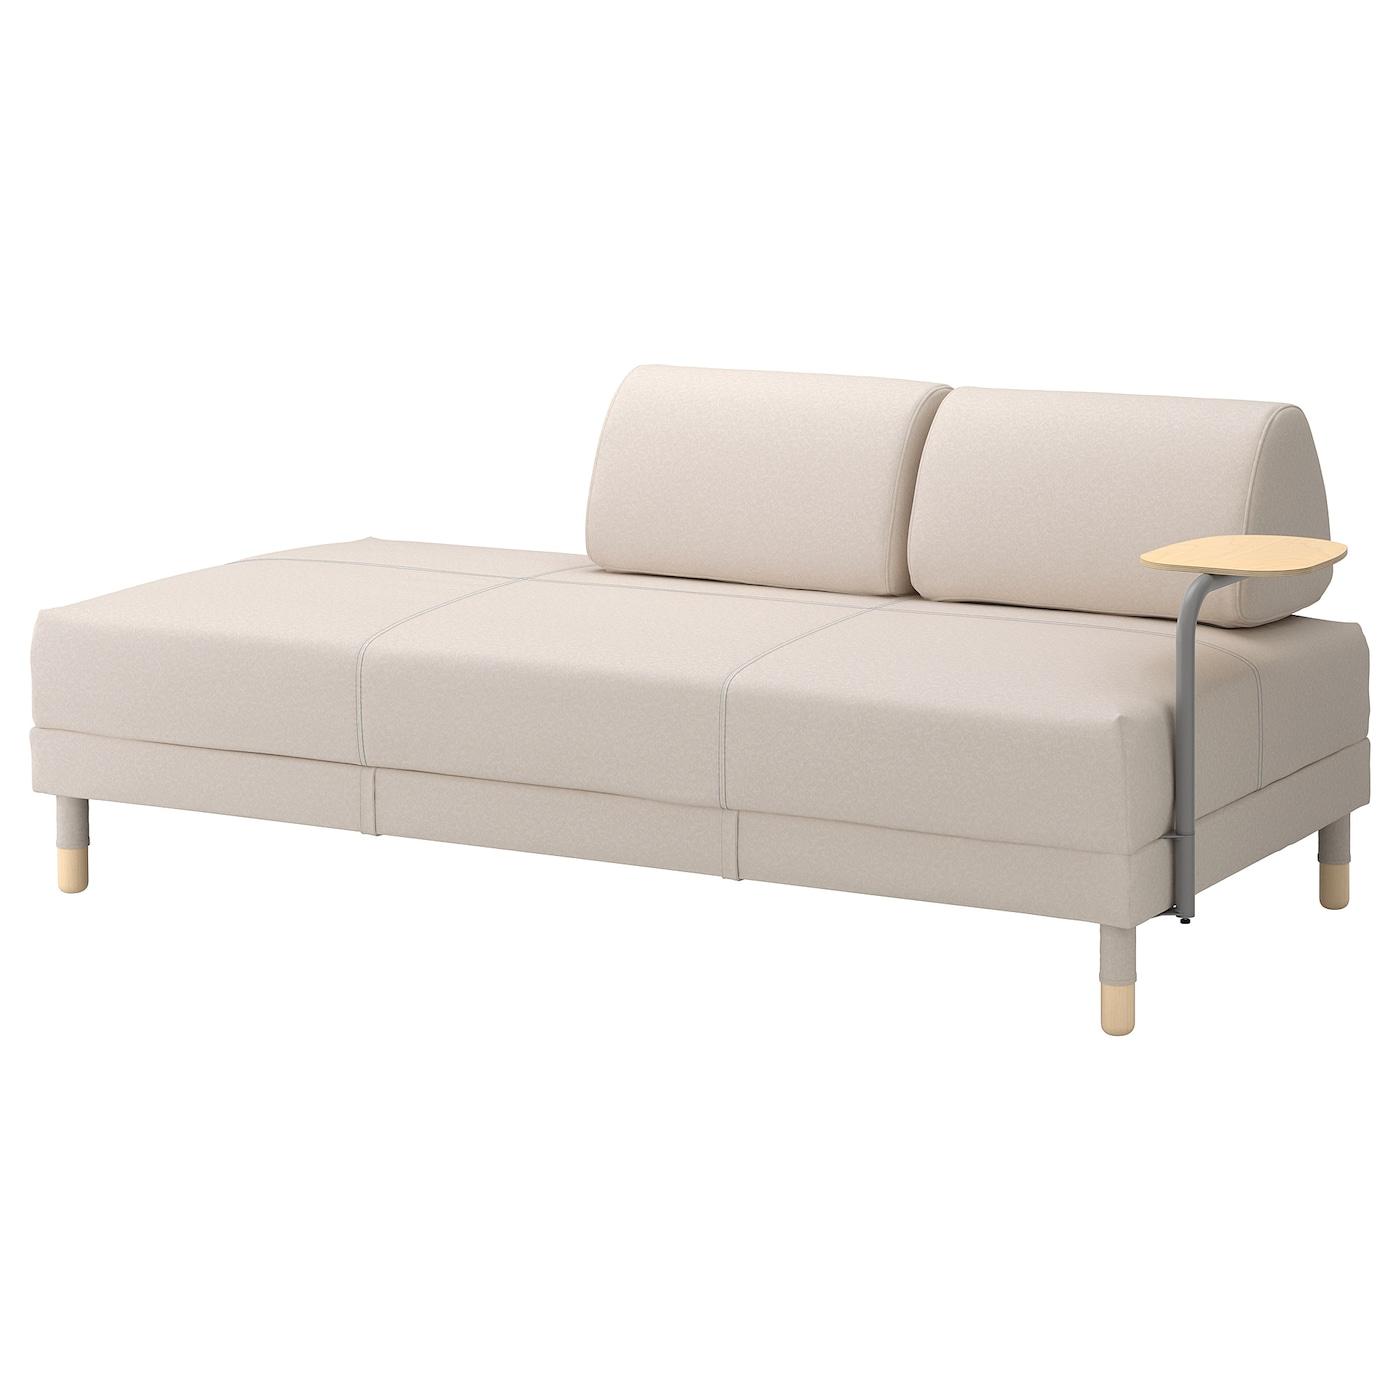 Flottebo sof cama mesa auxiliar lofallet beige 90 cm ikea - Mesa auxiliar sofa ...